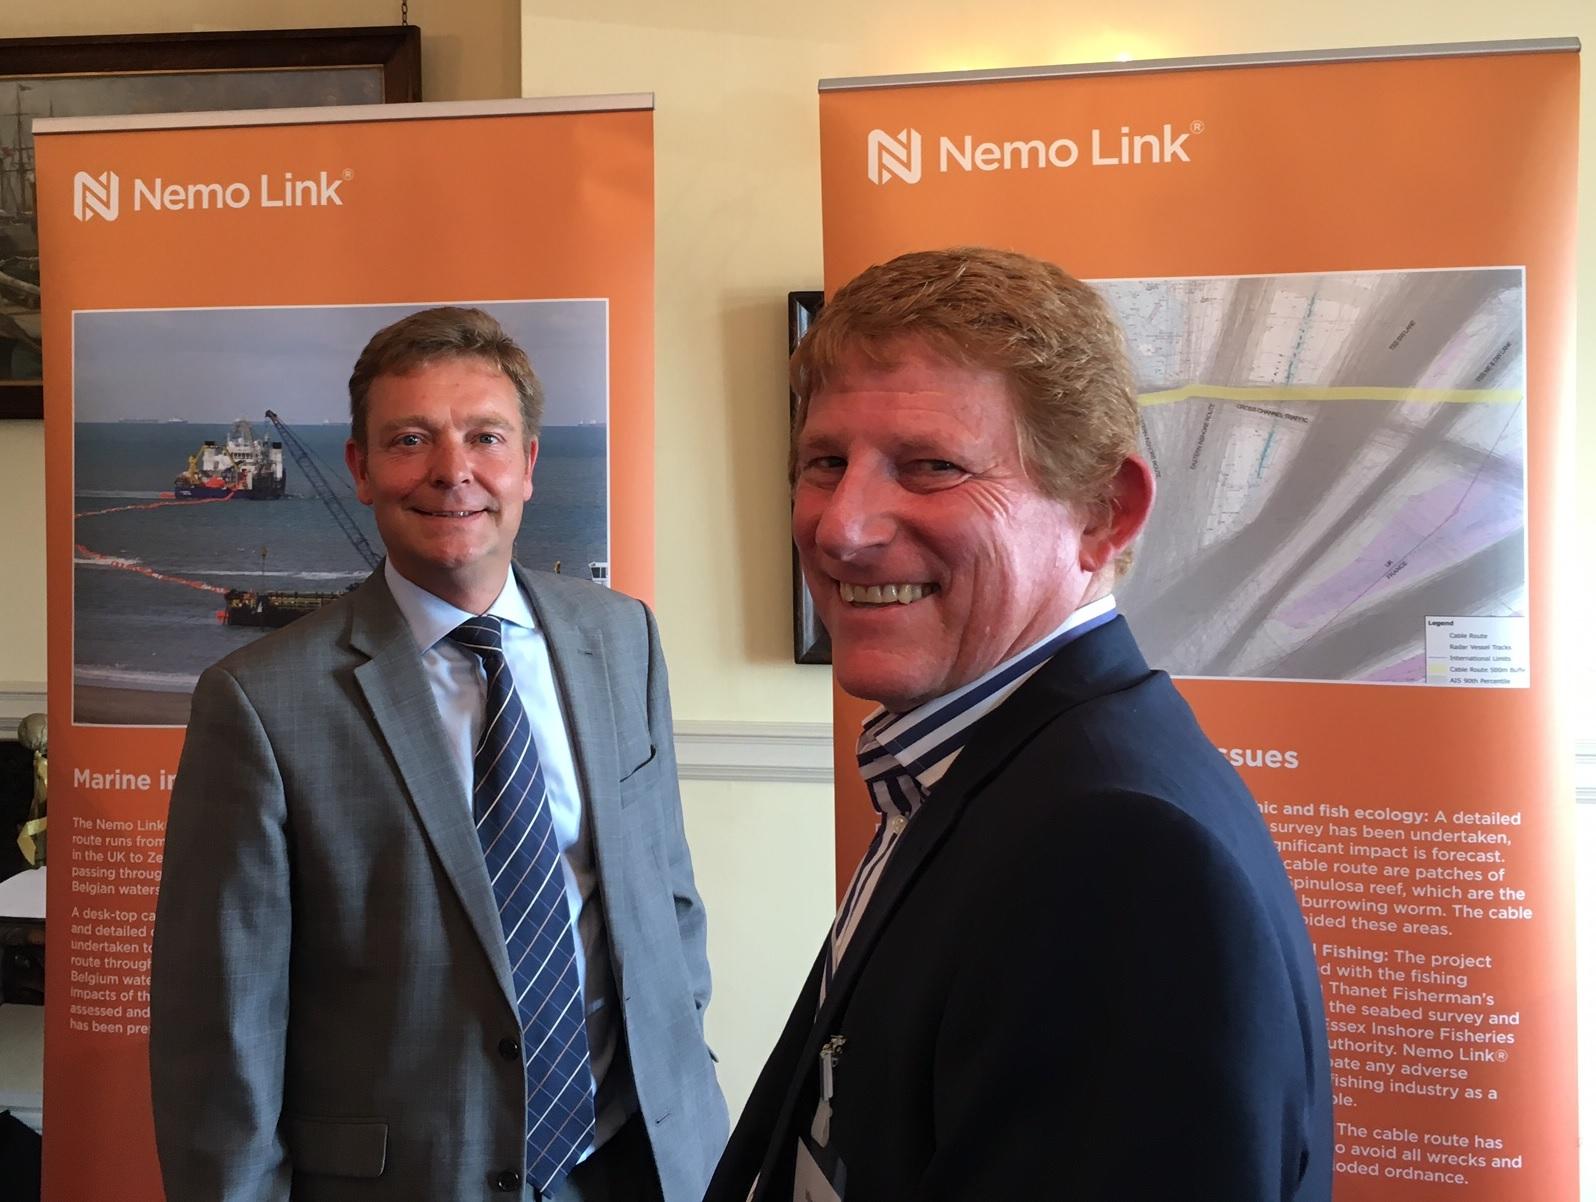 CM at Nemo Link event 17 Aug17.jpg